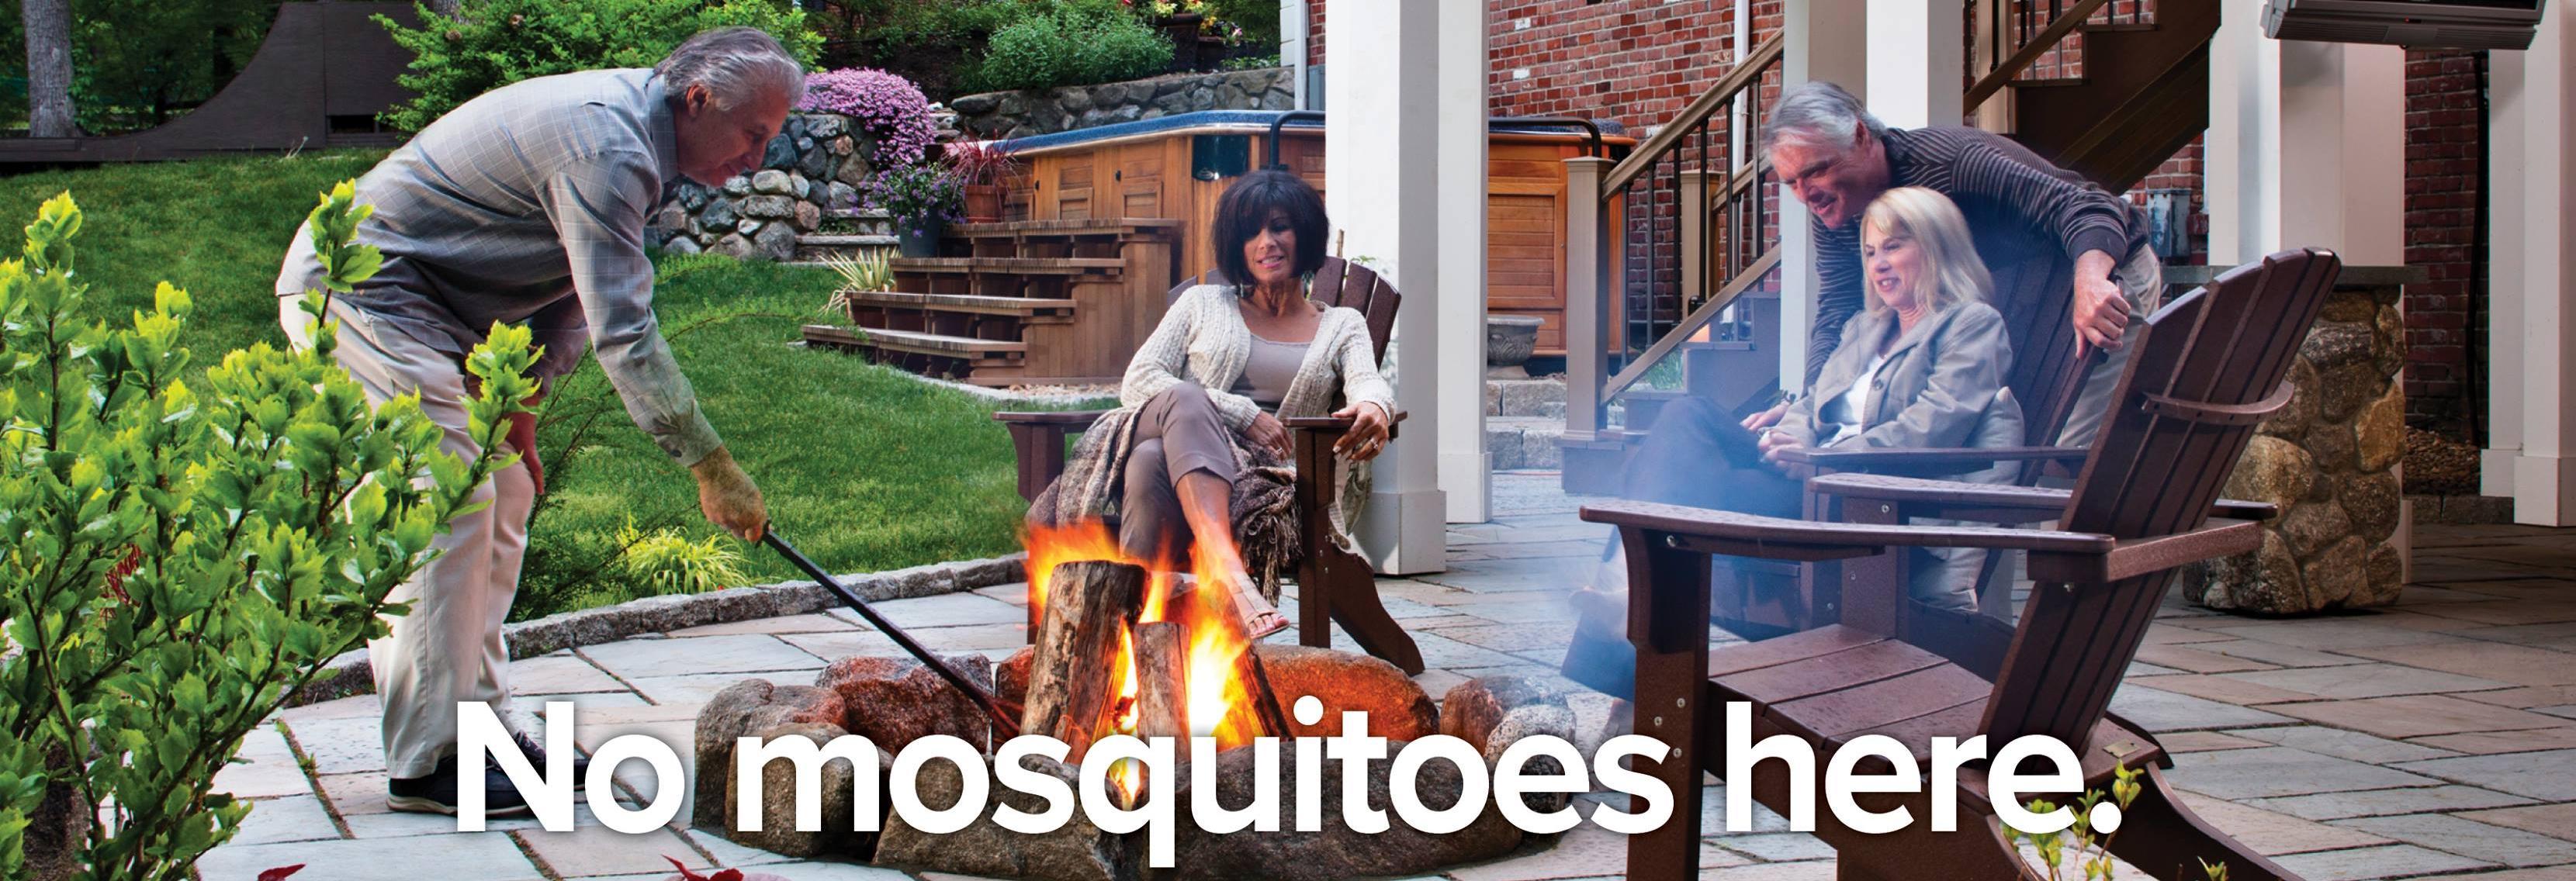 Mosquito Squad banner